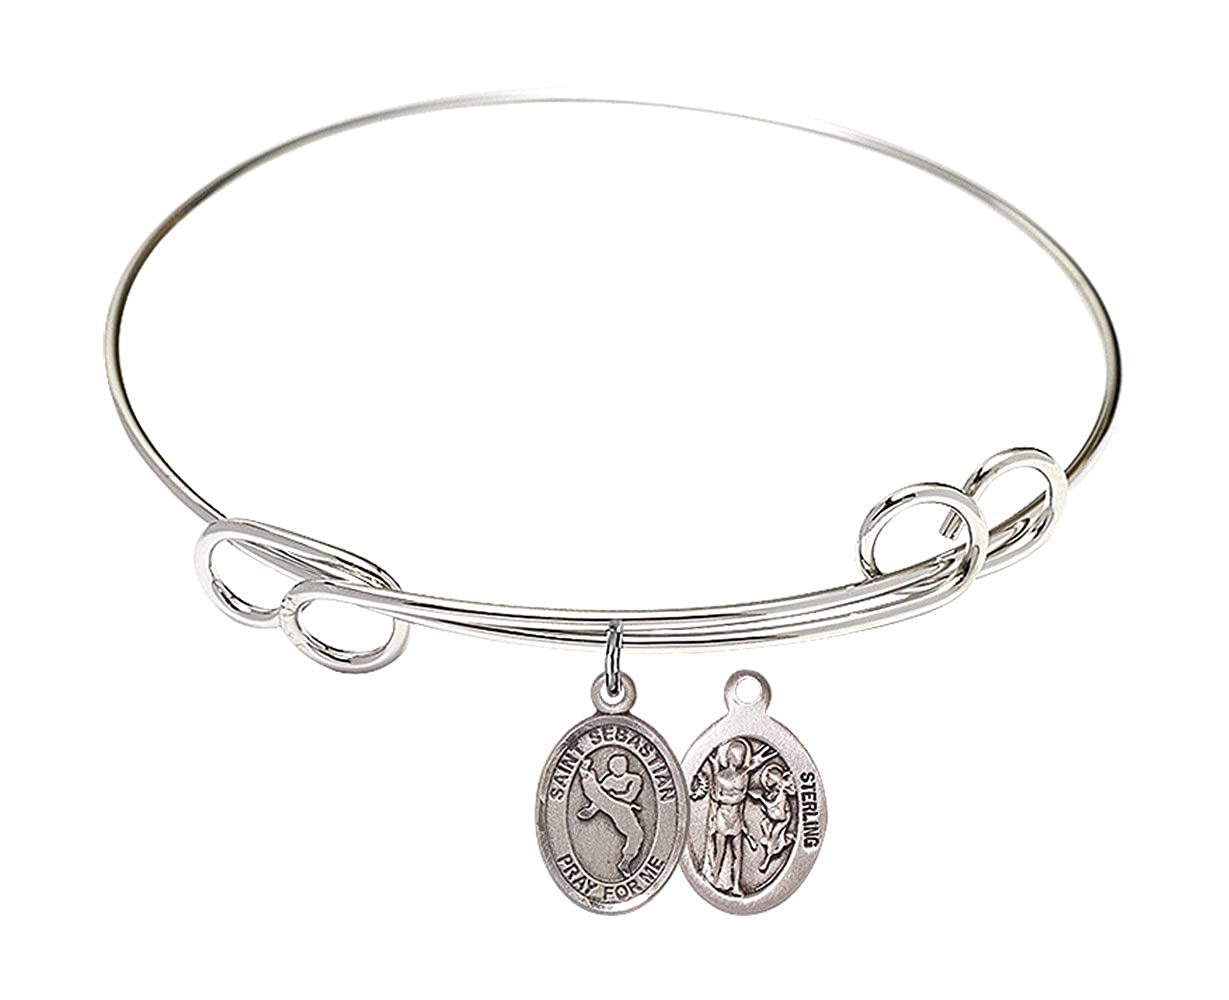 DiamondJewelryNY Double Loop Bangle Bracelet with a St Sebastian//Martial Arts Charm.